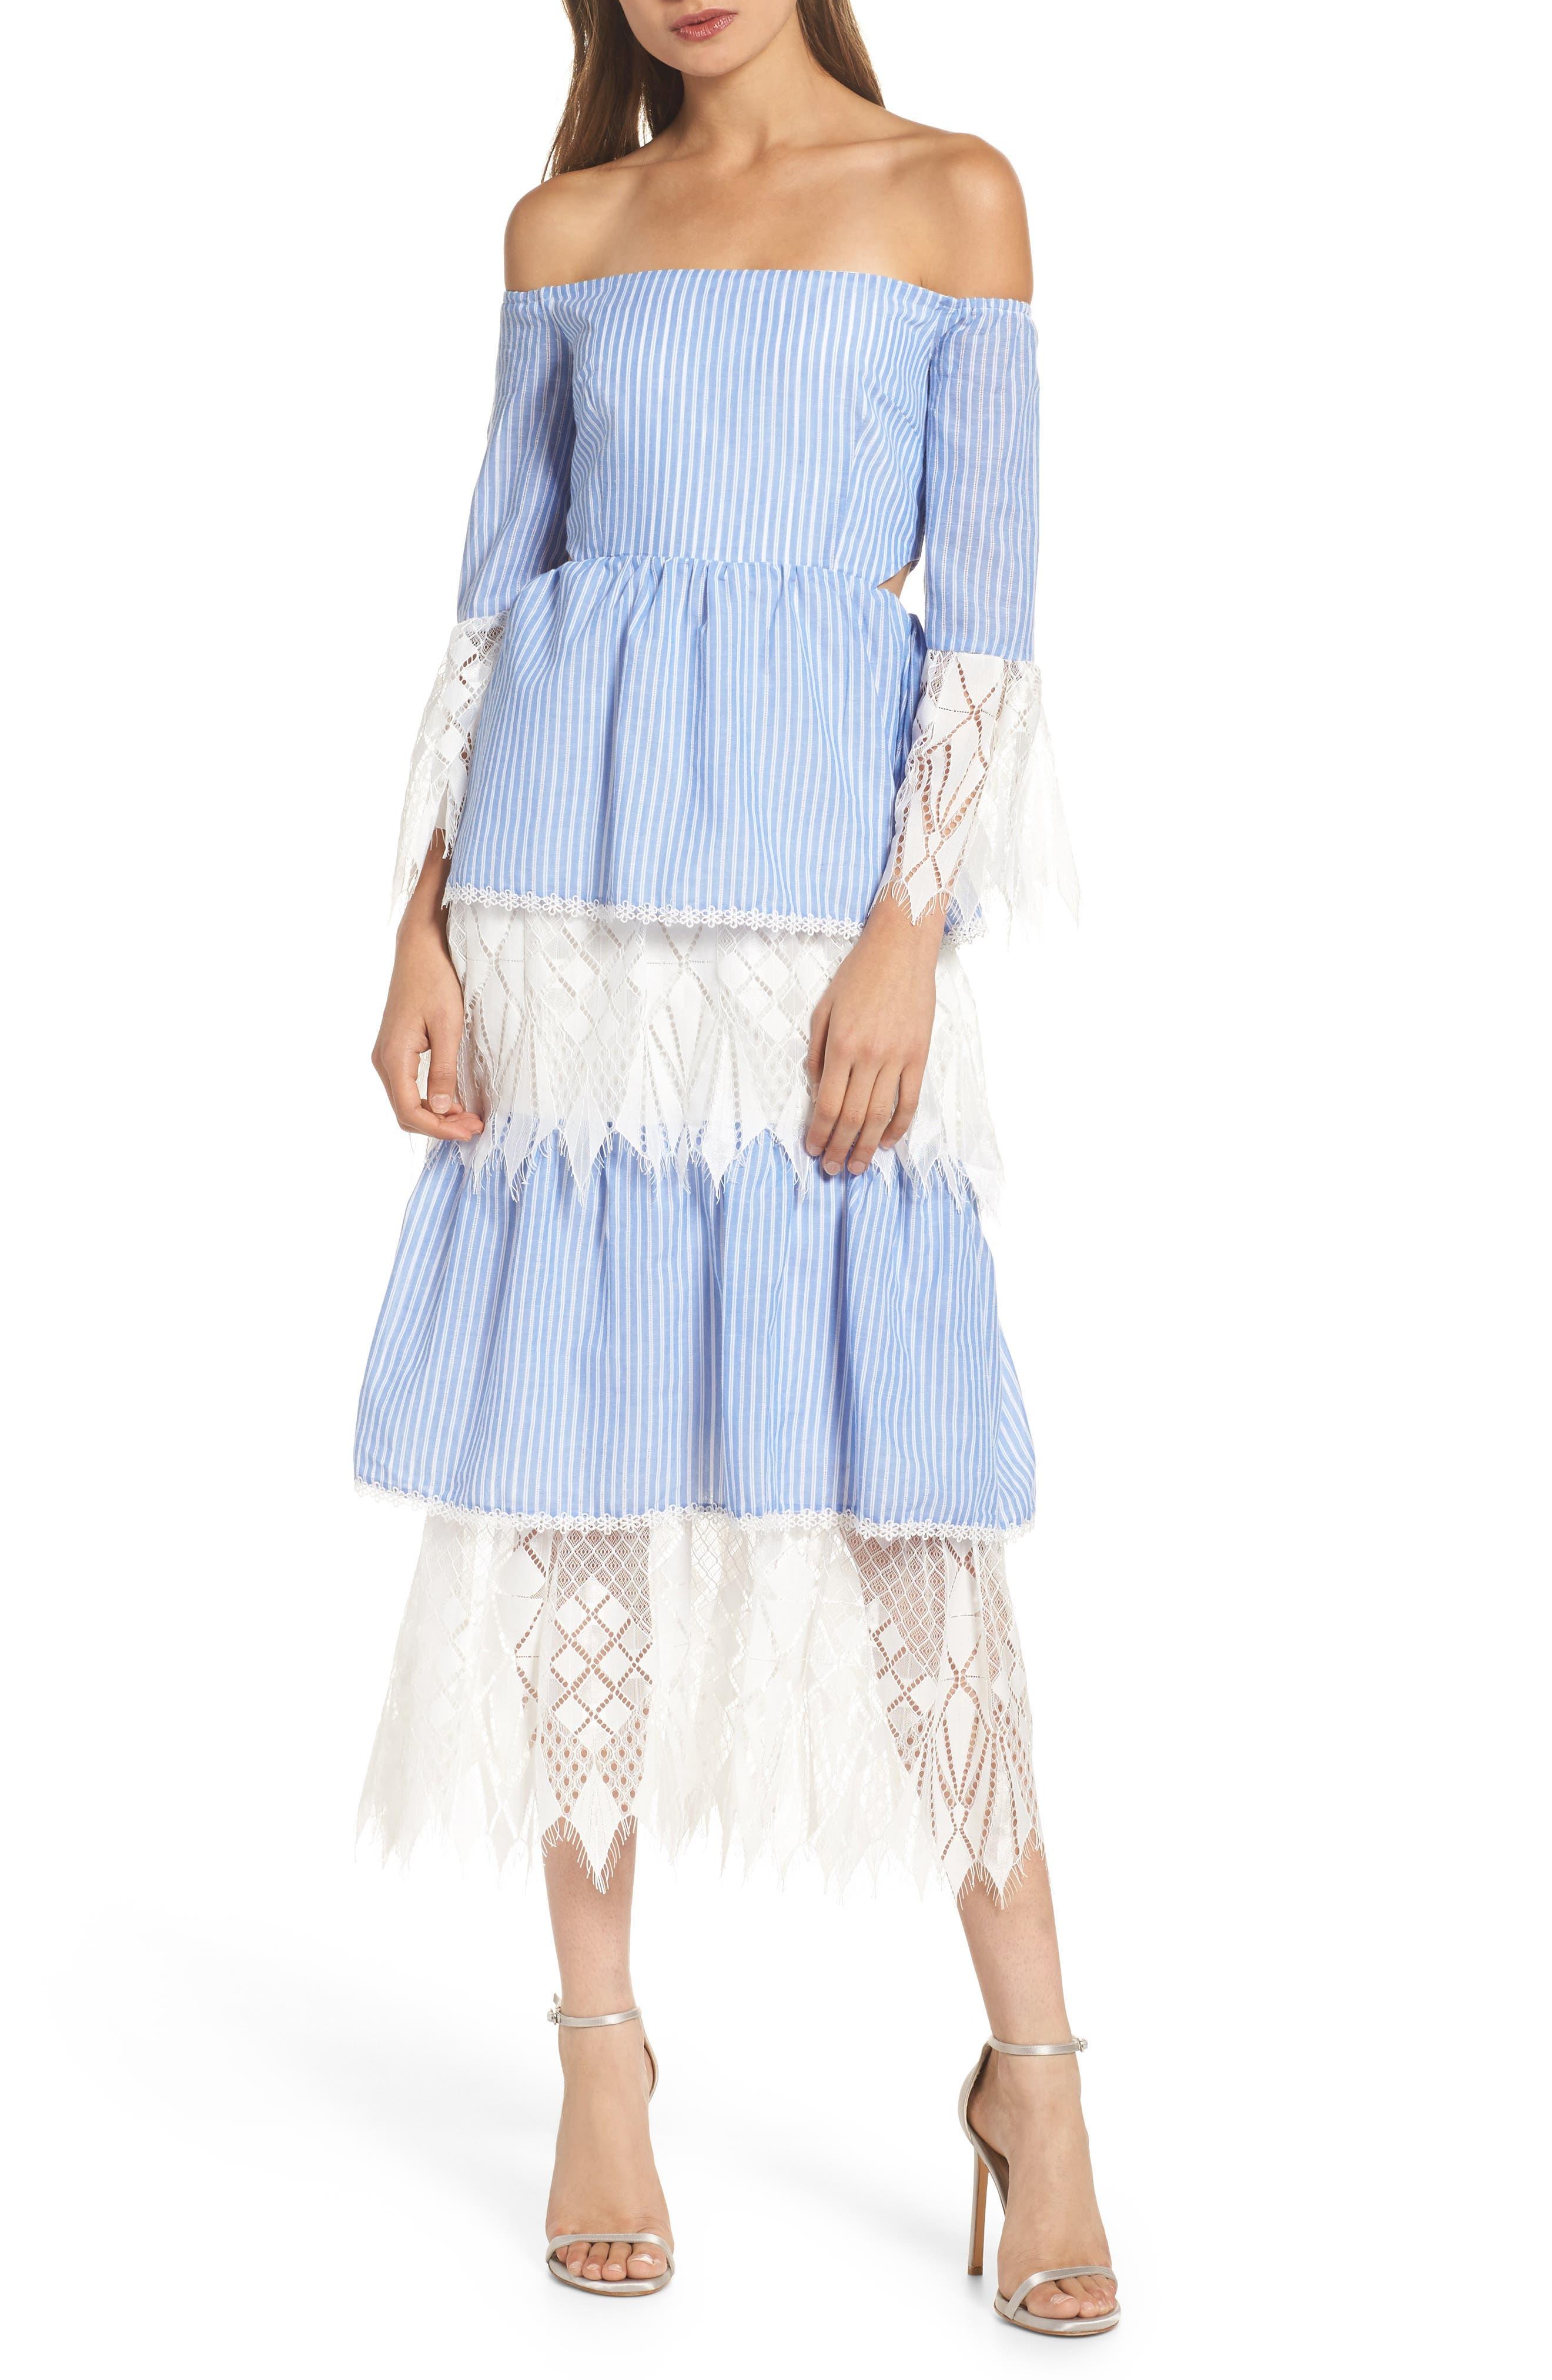 Addison Lace Tier Off the Shoulder Midi Dress,                             Main thumbnail 1, color,                             434